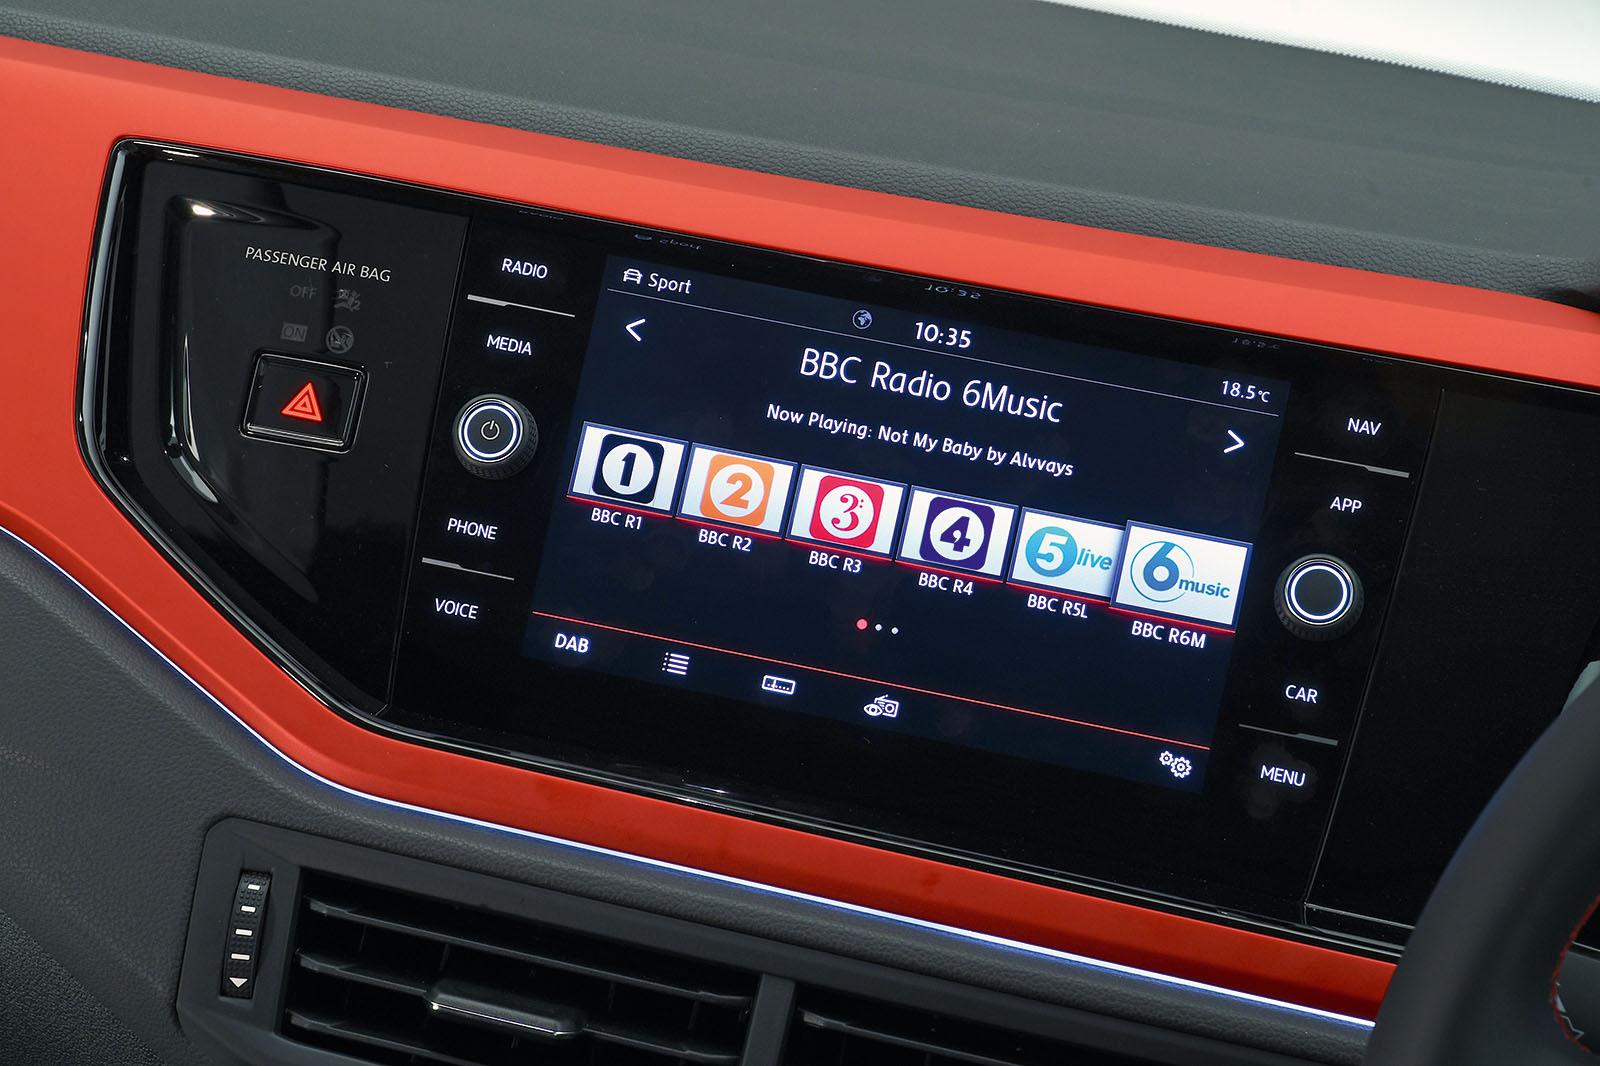 2018 Volkswagen Polo GTI infotainment